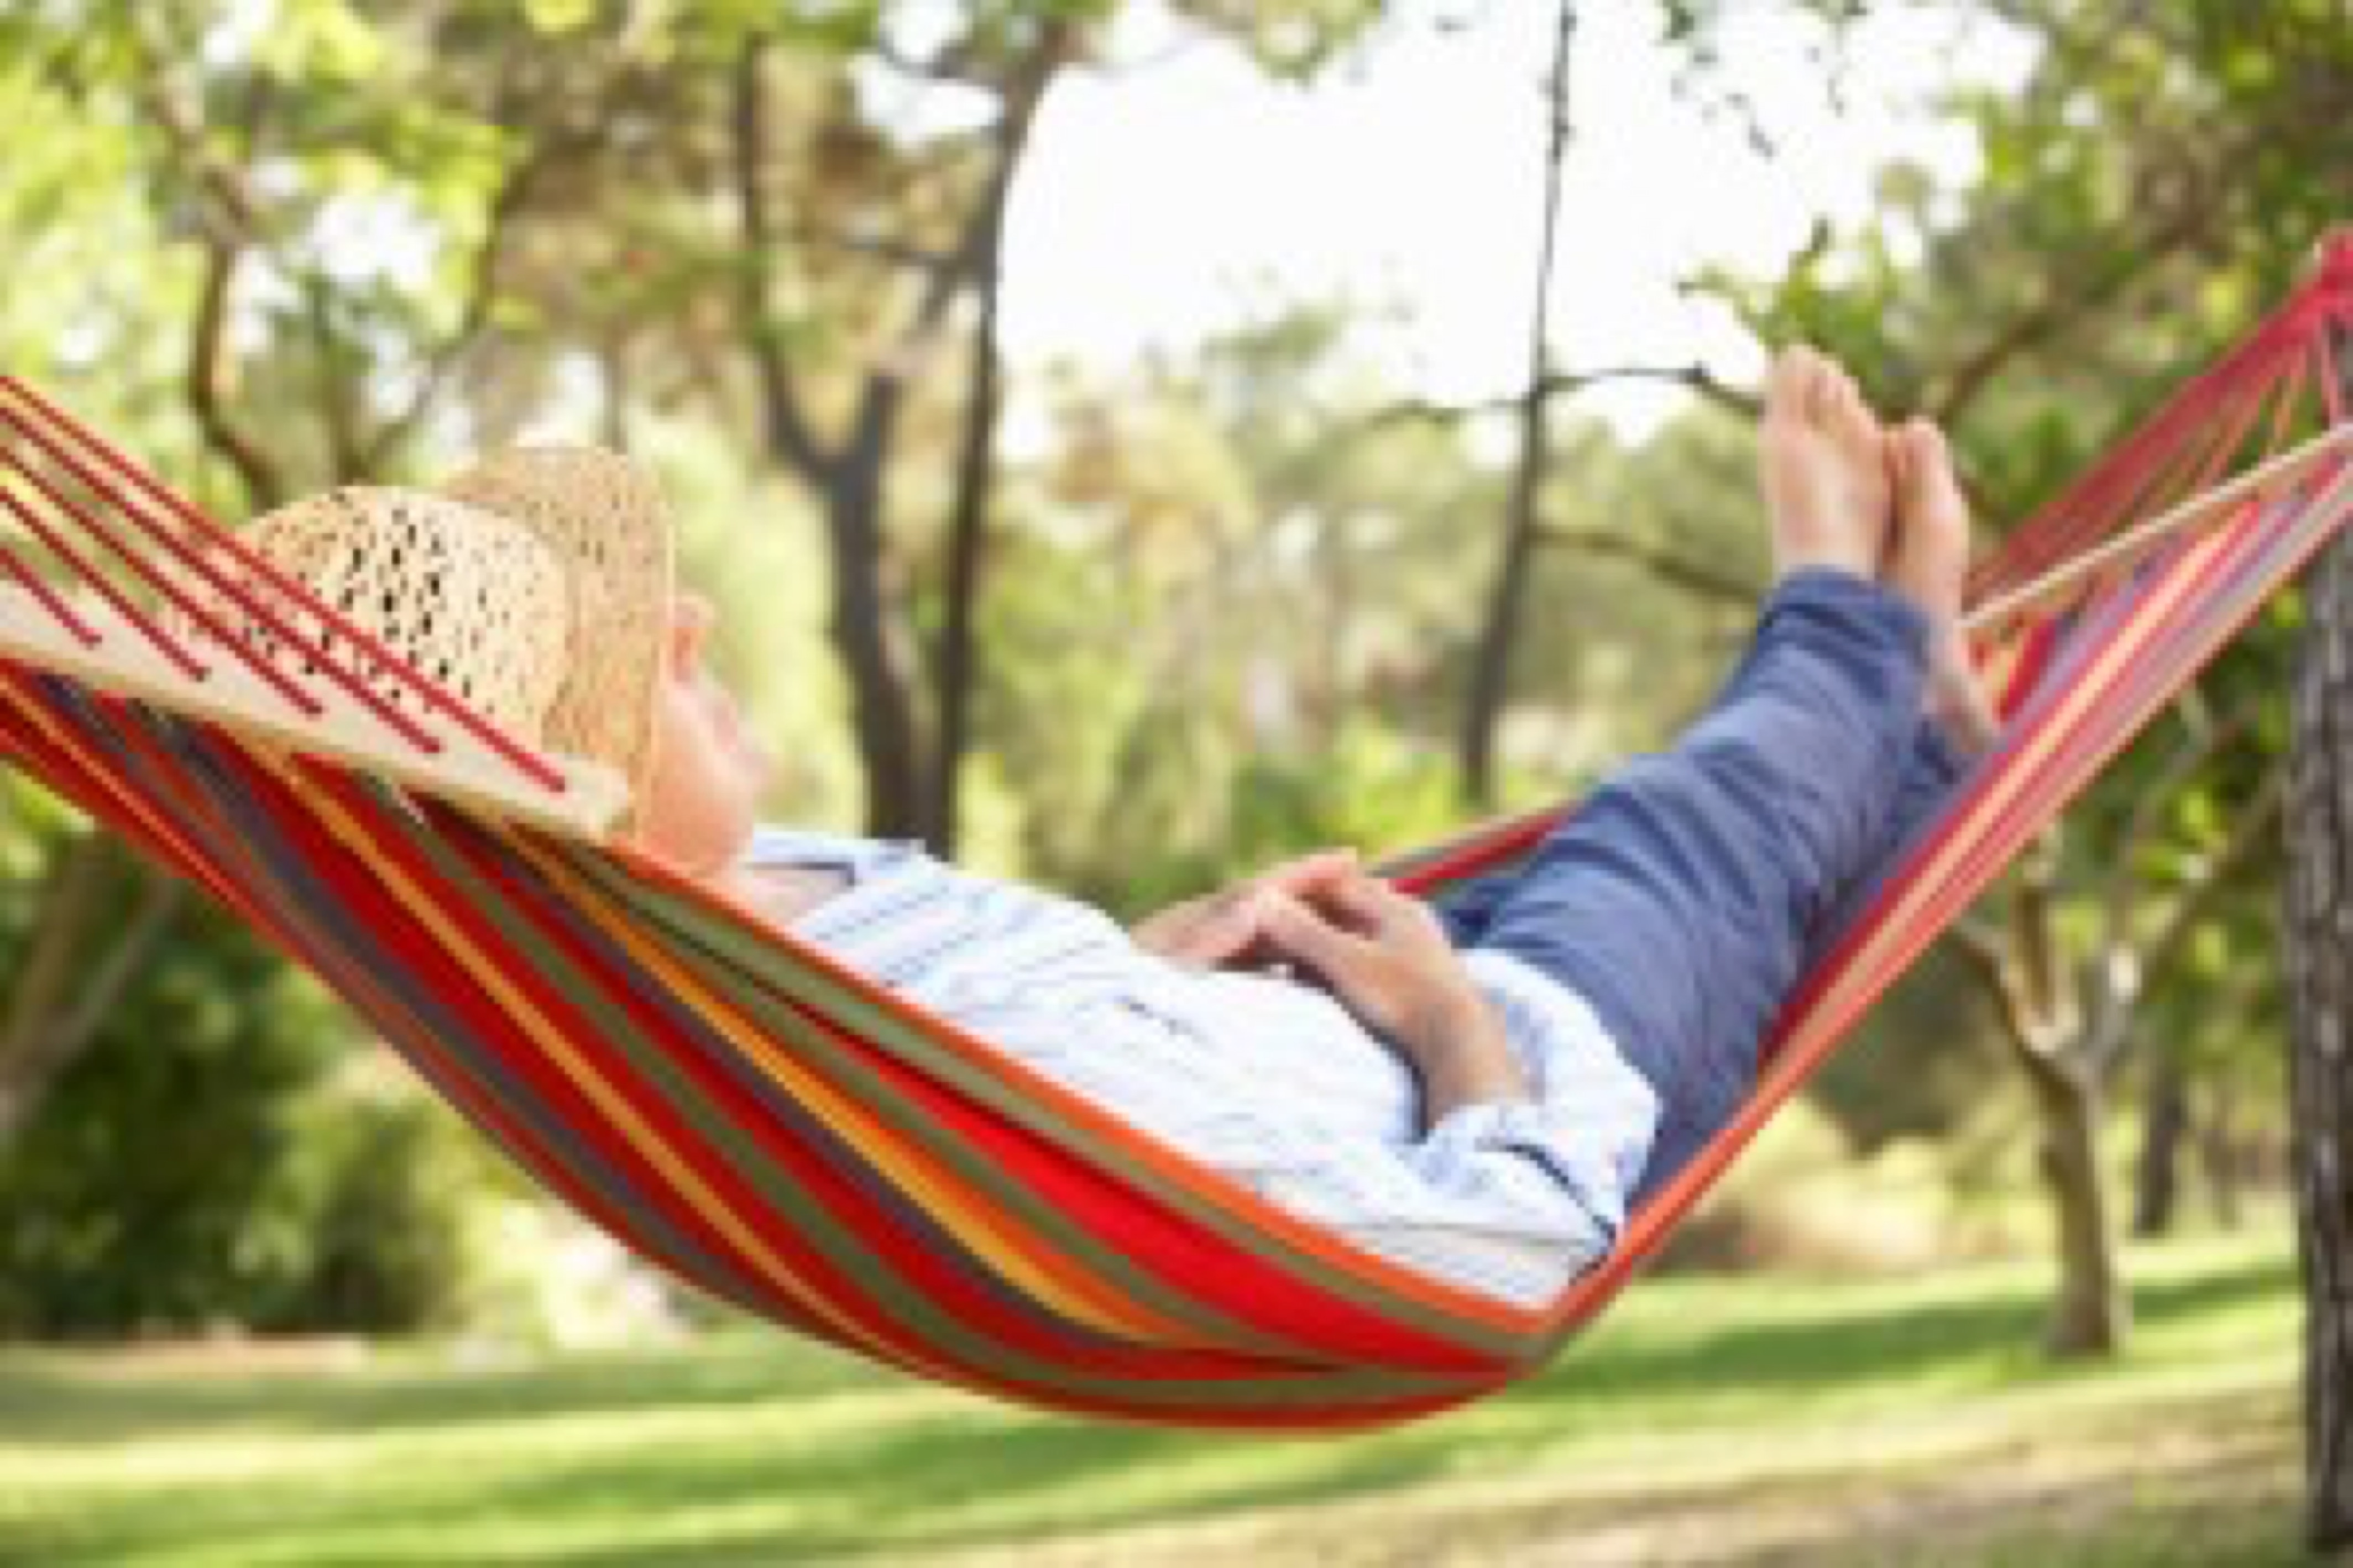 Senior Man Relaxing In Hammock Alseep In Sunshine